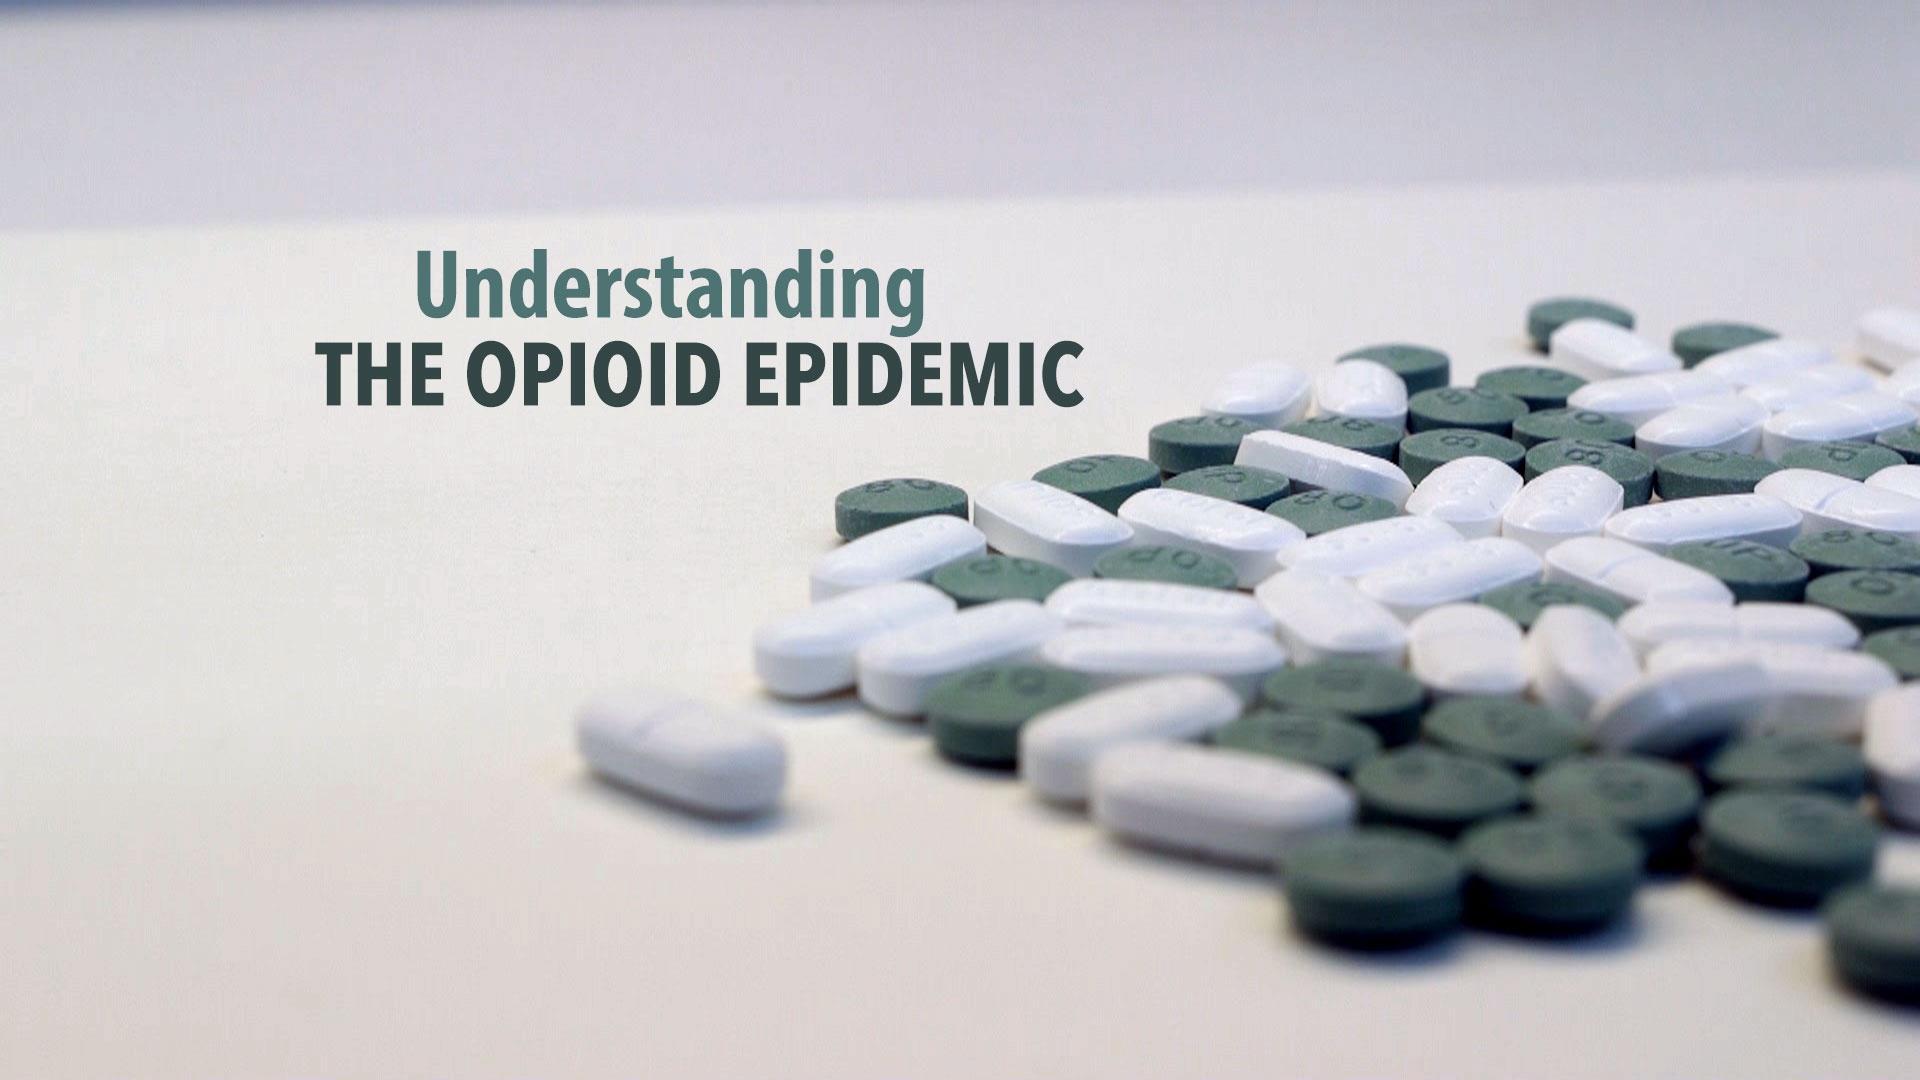 Undersatnding the Opioid Epidemic